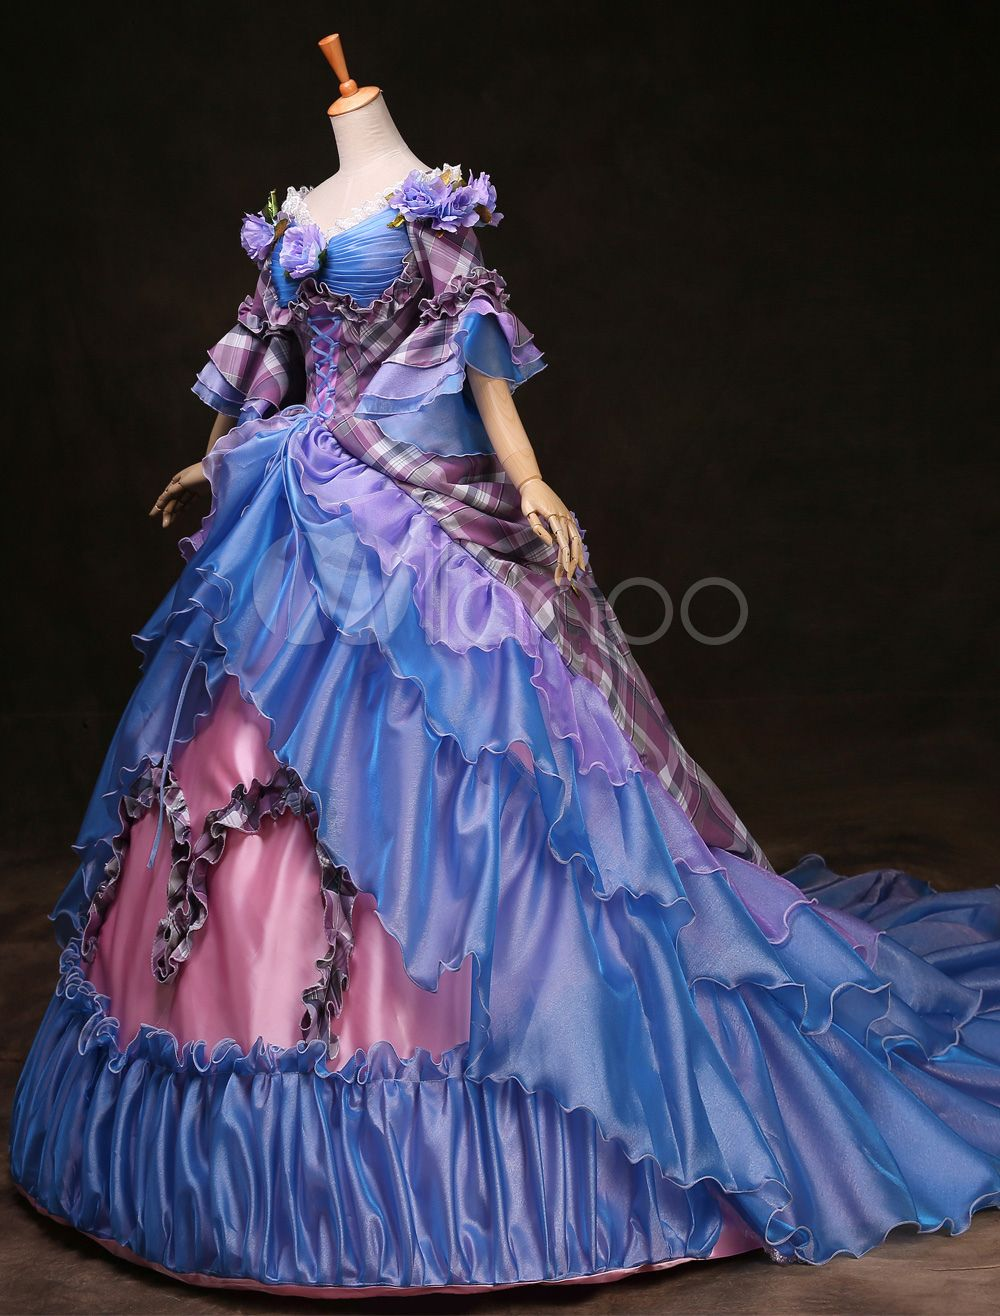 Milanoo / Royal Retro Costume Women's Rococo Ball Gown